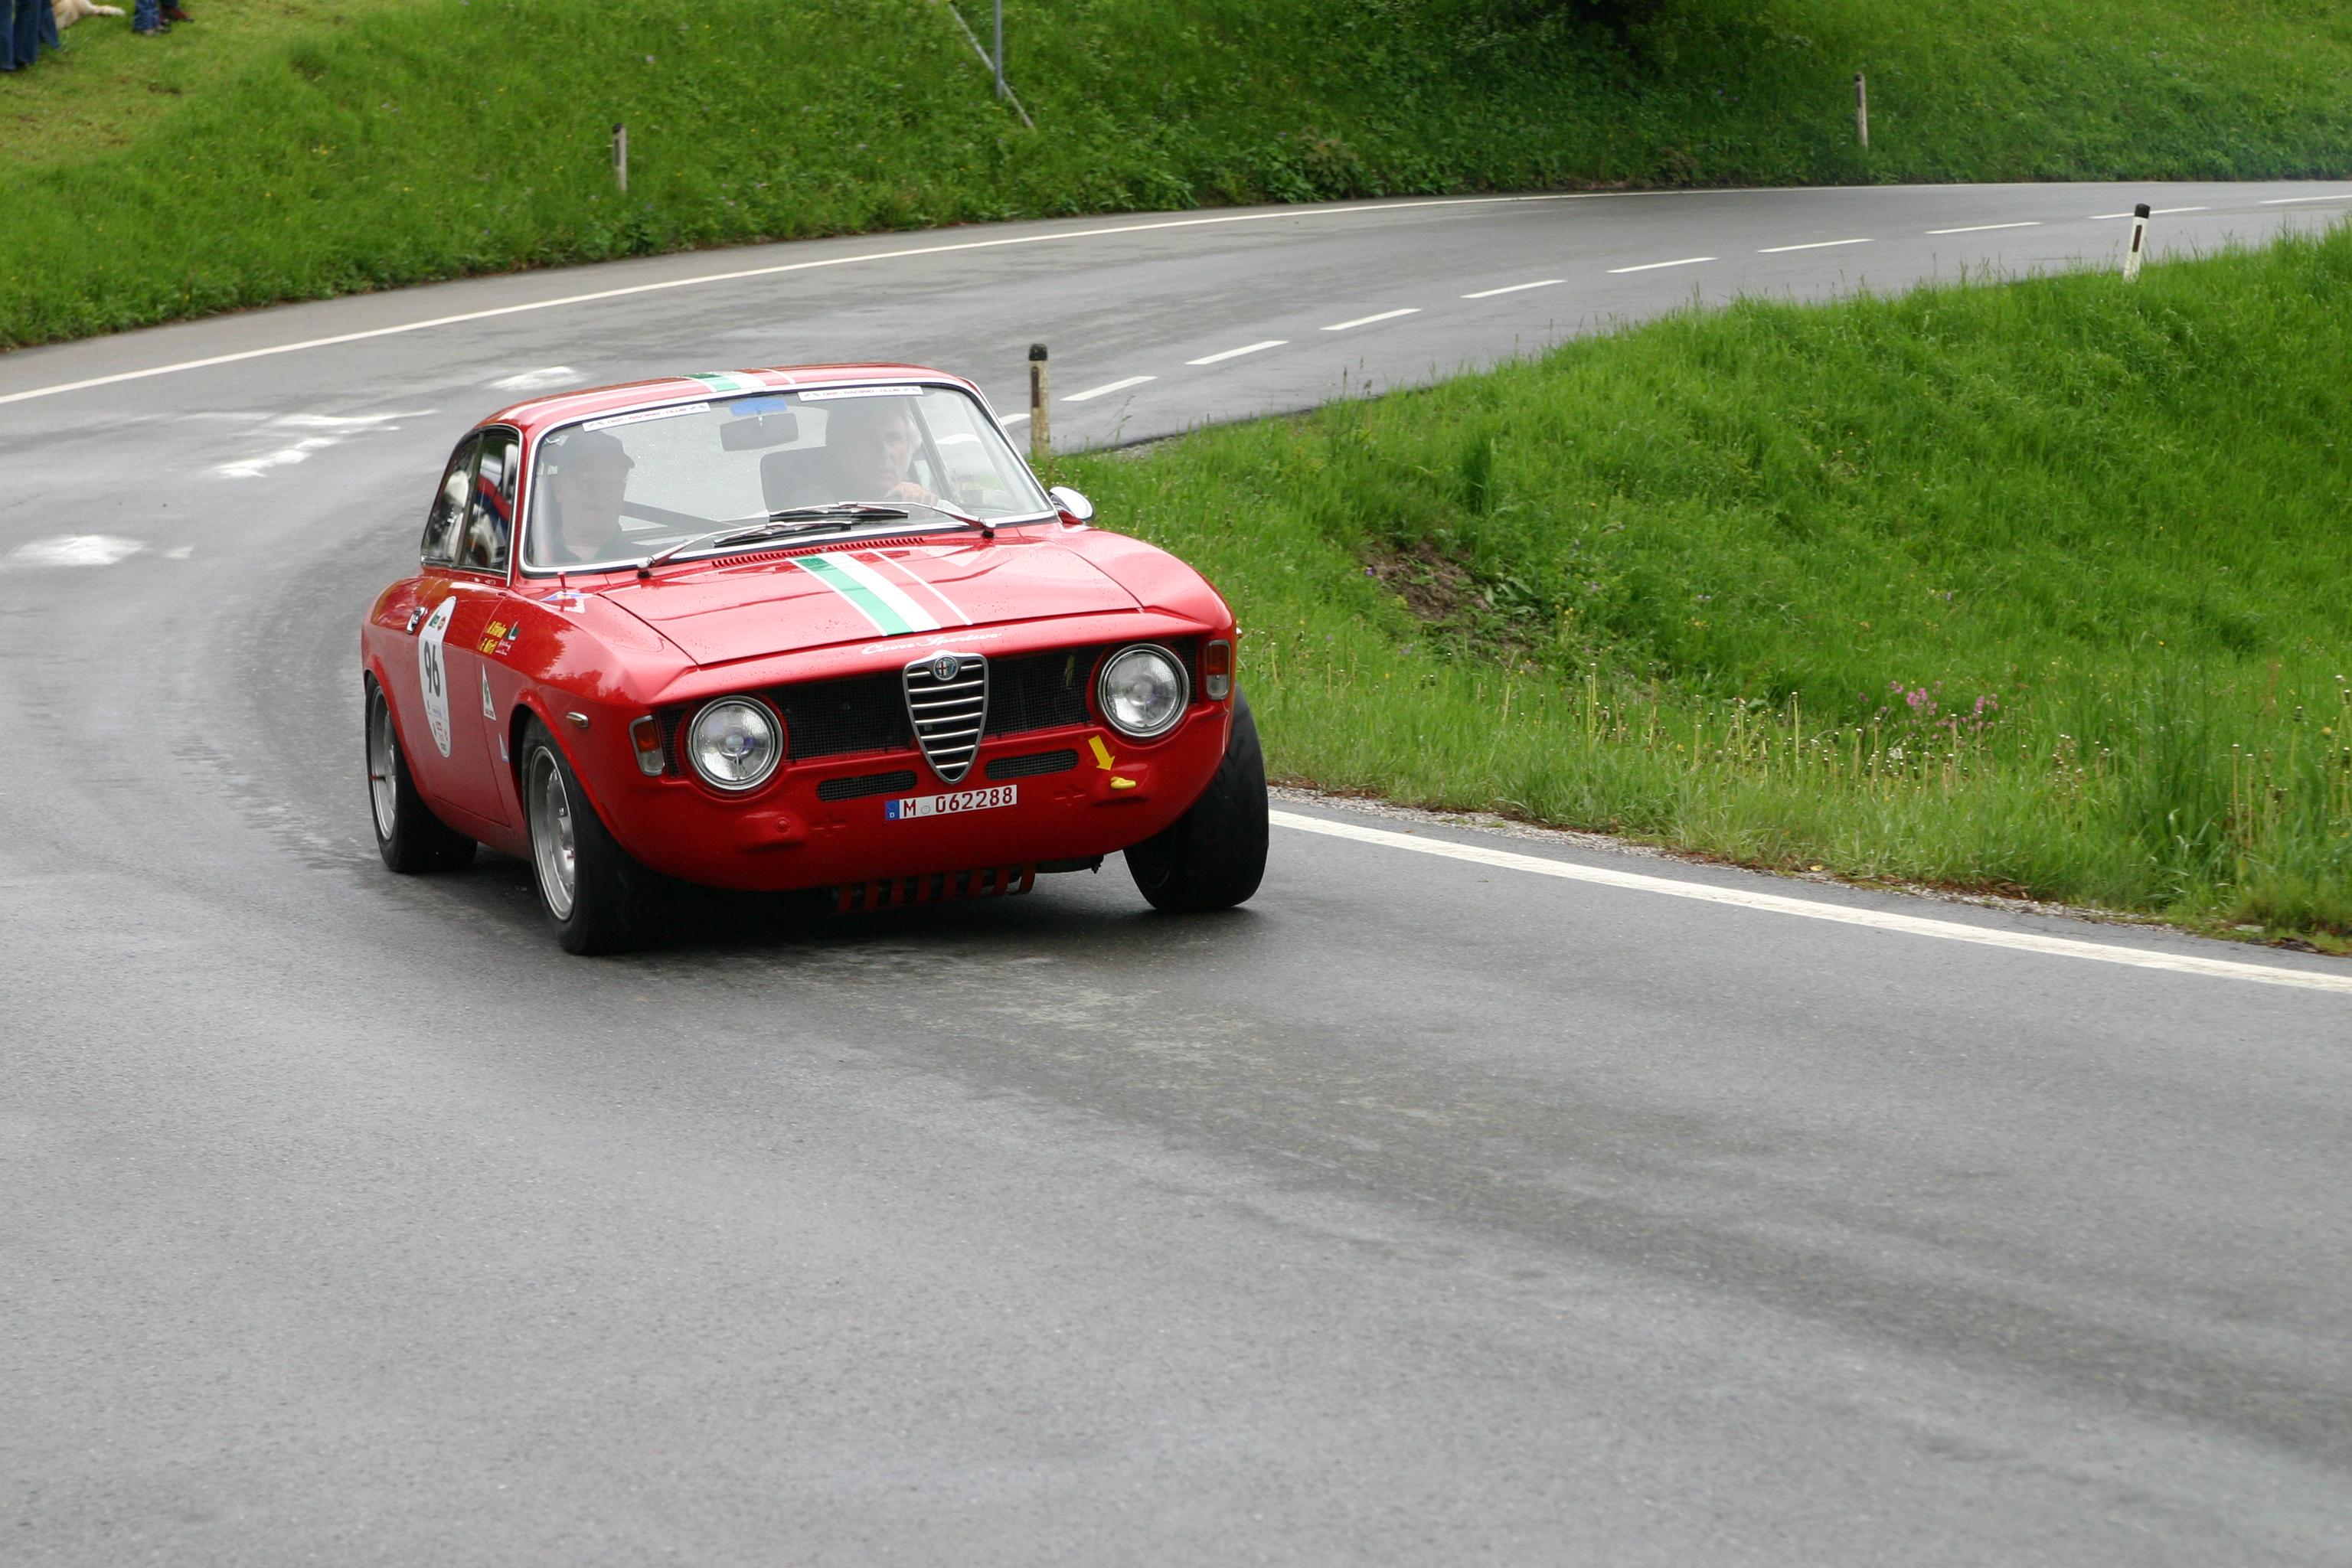 AlfaRomeo Giulia Sprint GT technical details, history, photos on Better Parts LTD